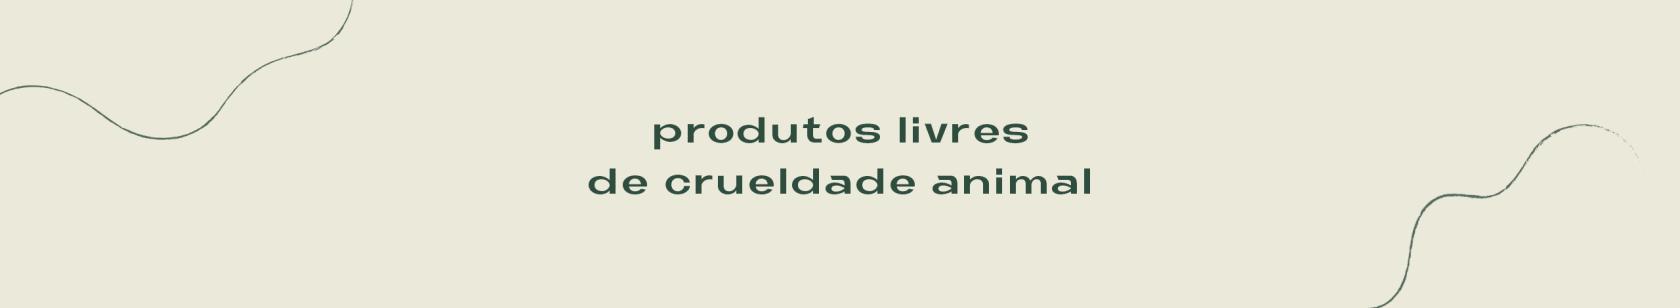 PRODUTOS CRUELTY FREE